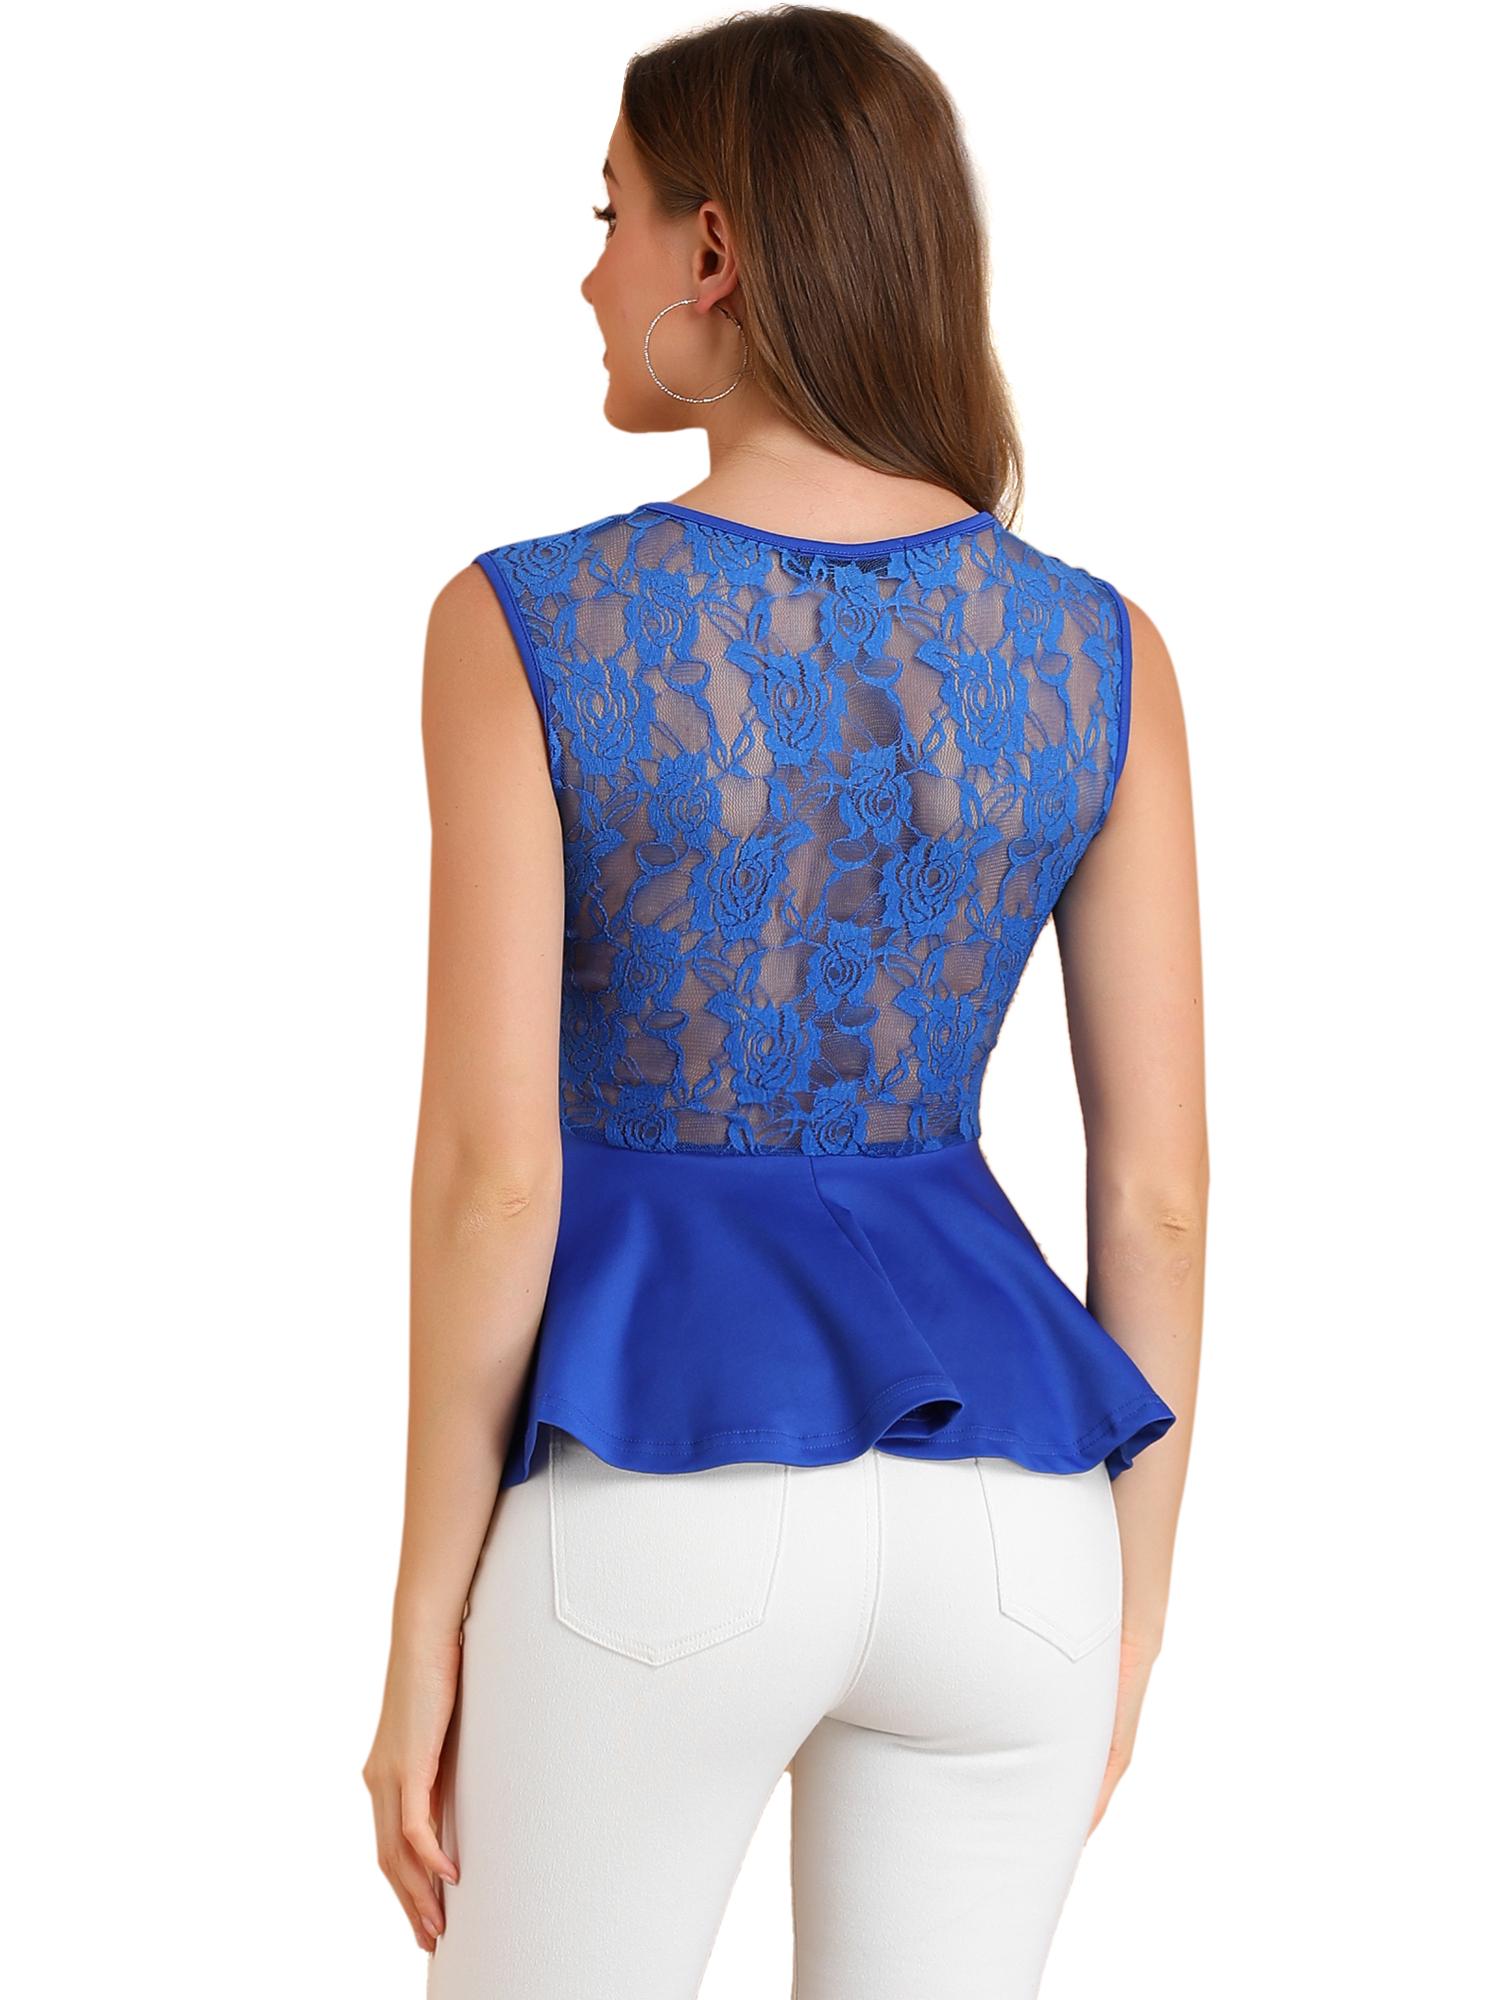 Women Round Neck Lace-Paneled Sleeveless Peplum Top Blue M